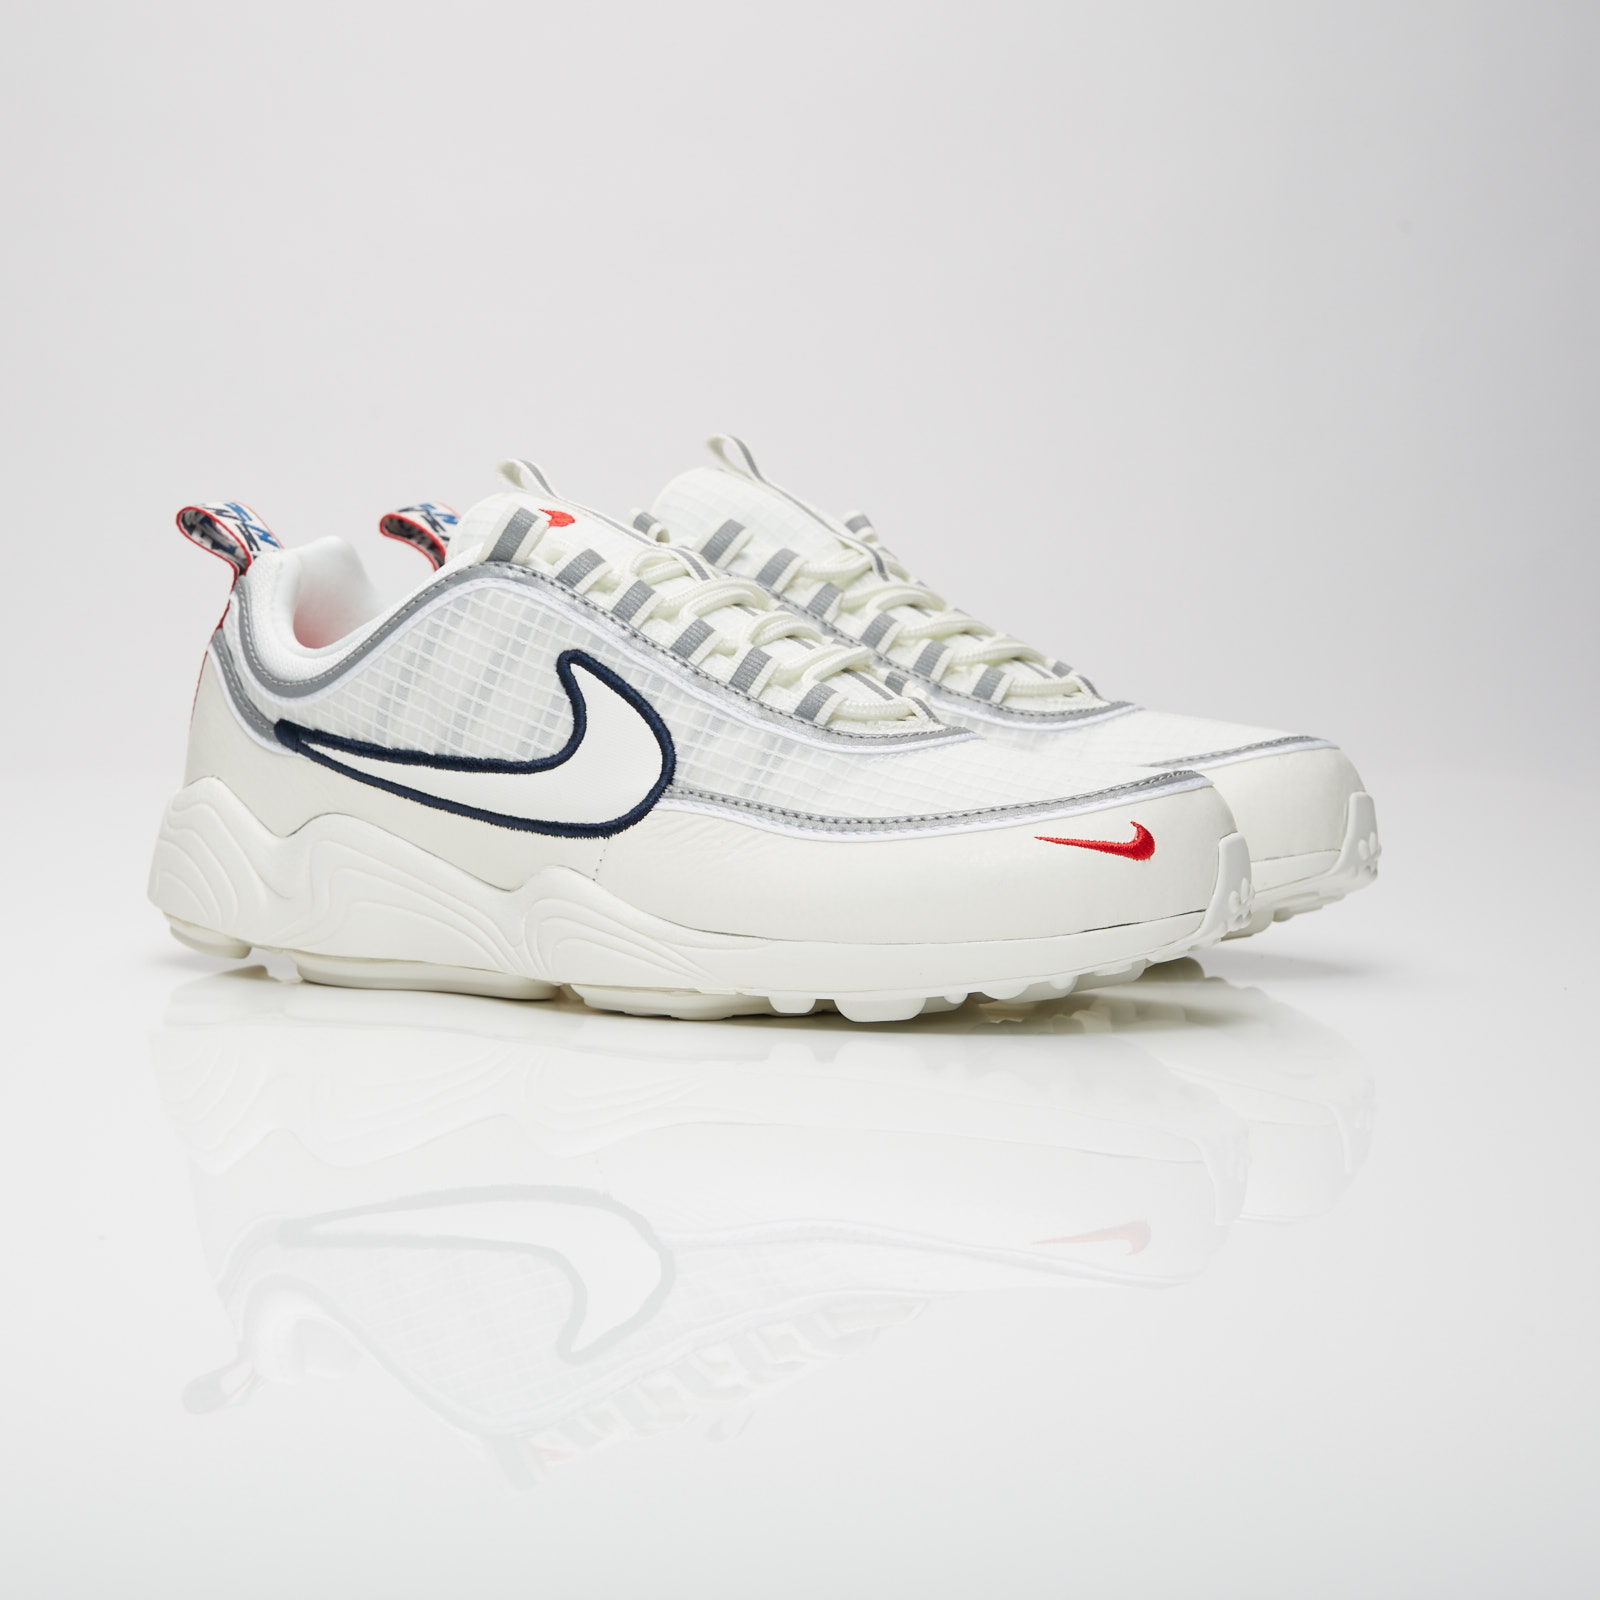 reputable site c76f3 471d0 Nike Sportswear Air Zoom Spiridon SE